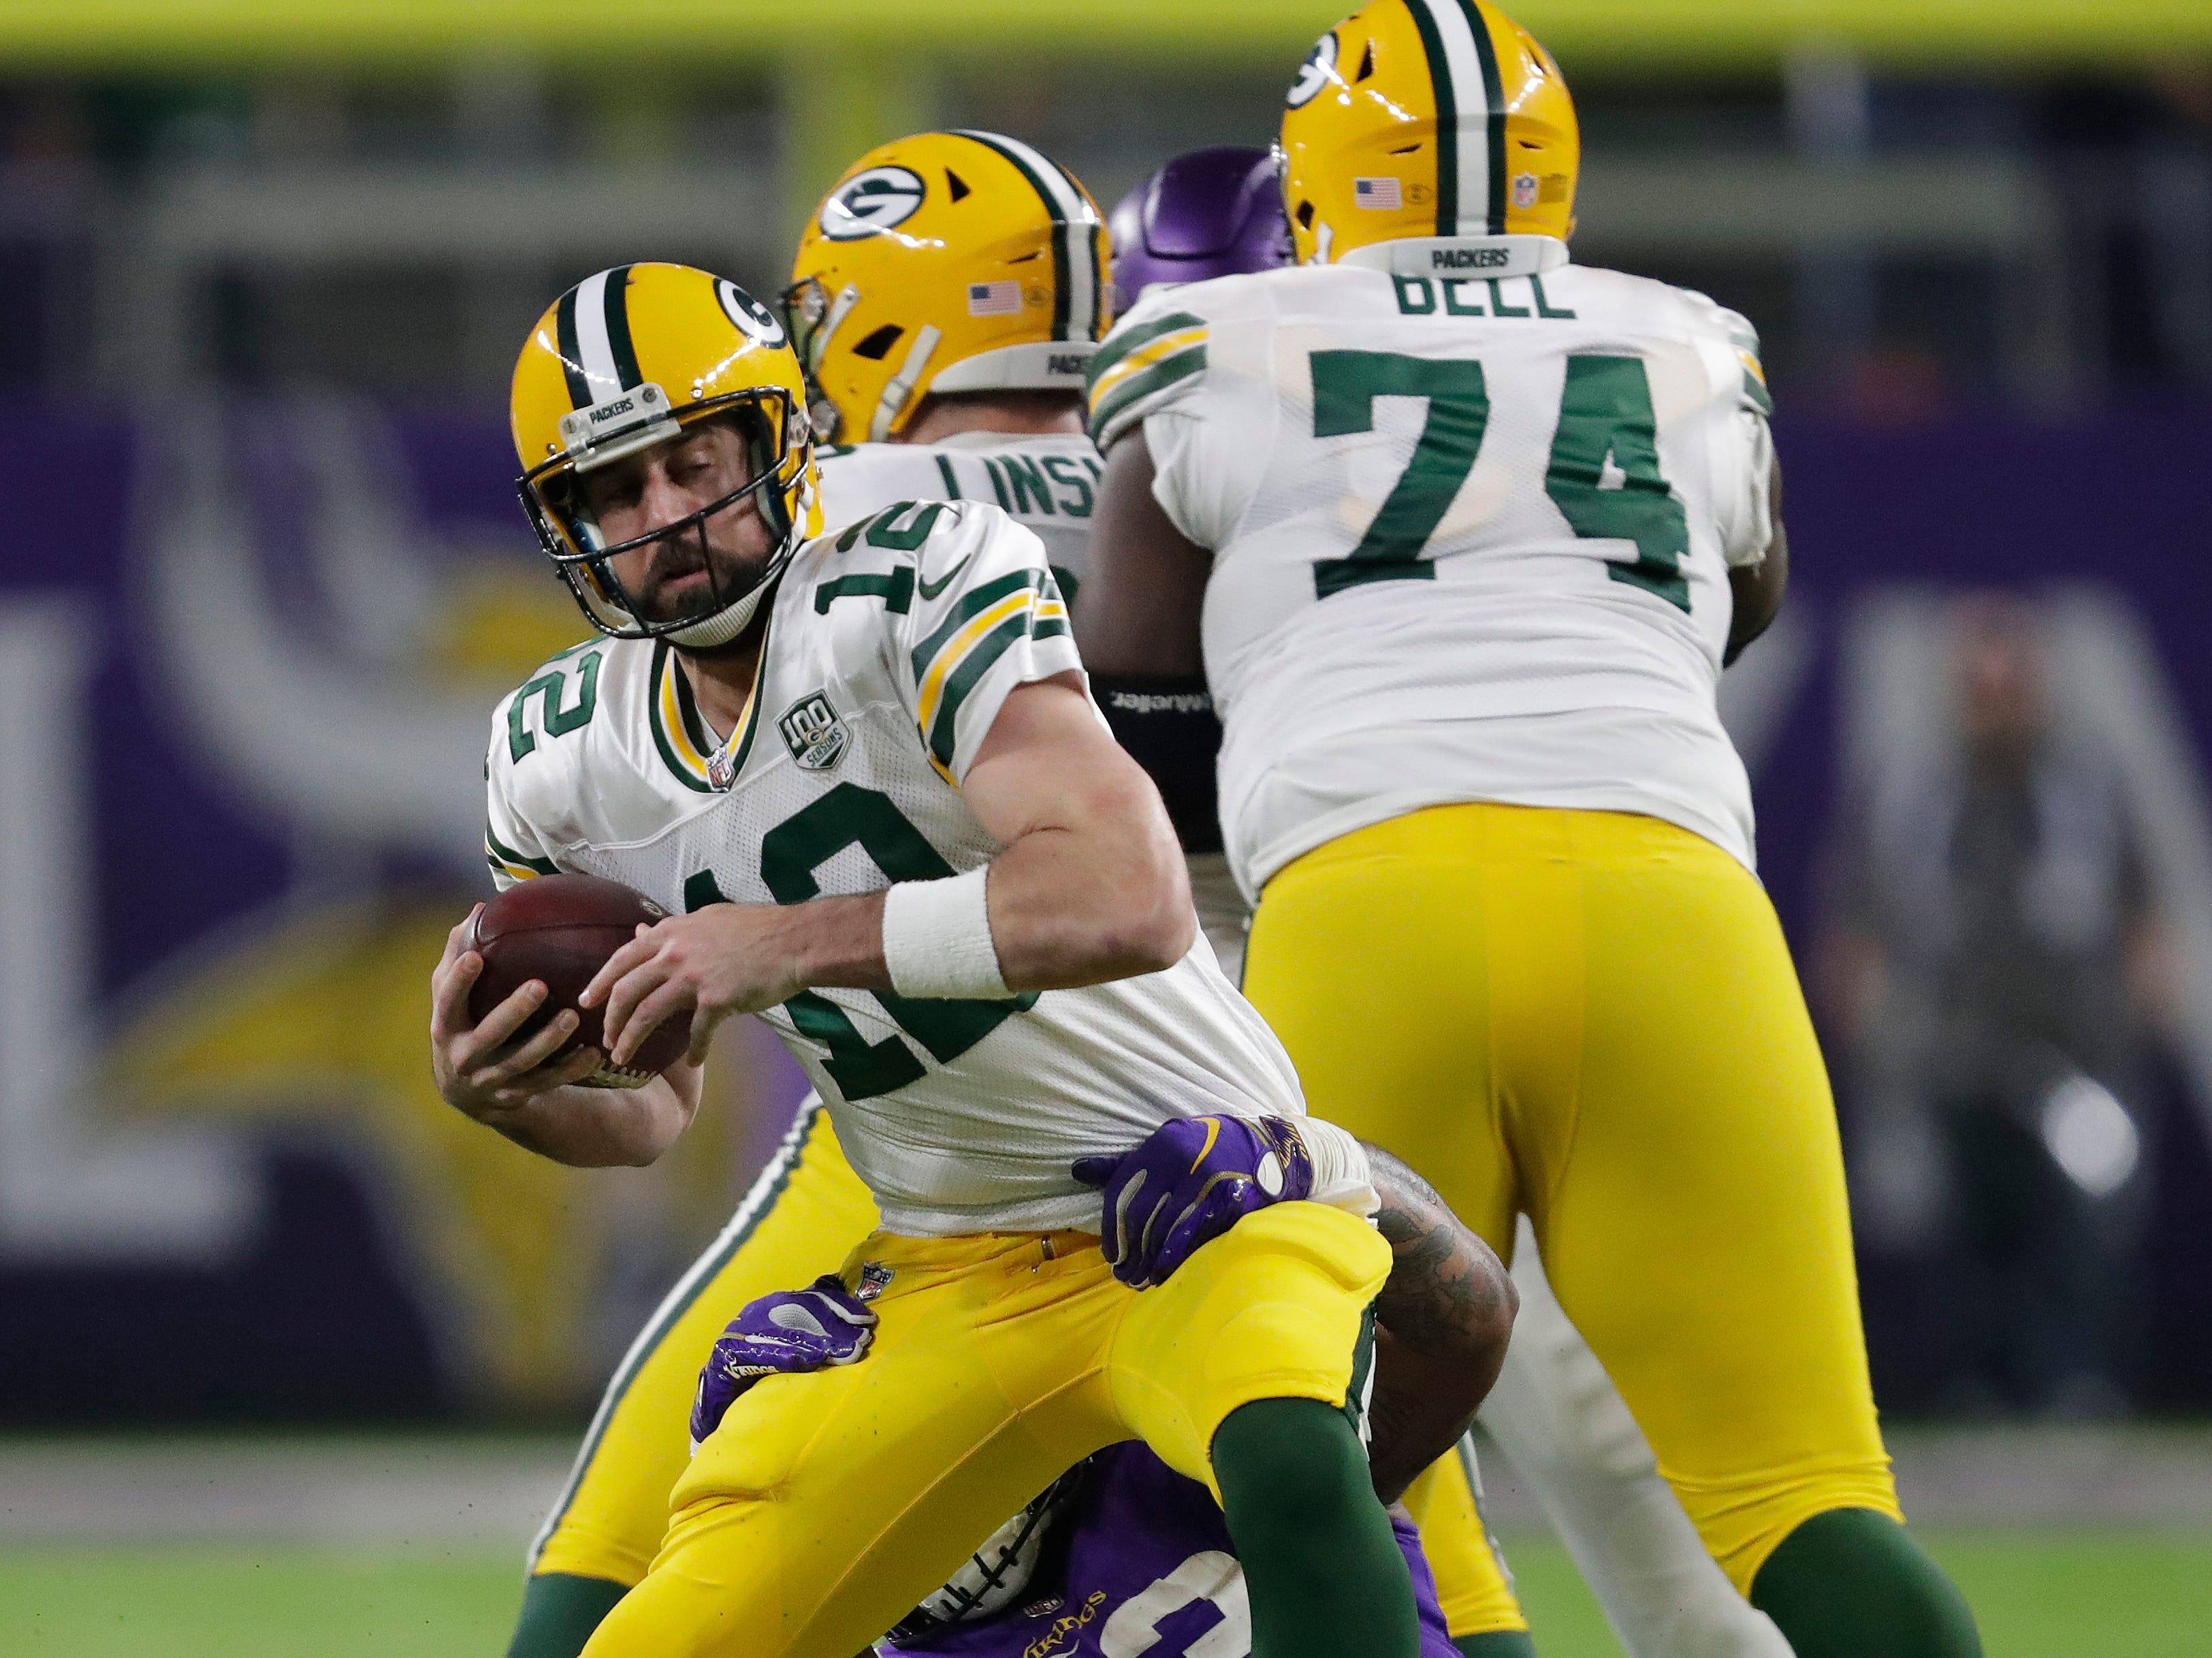 during their football game Sunday, November 25, 2018, at U.S. Bank Stadium in Minneapolis, Minn. Dan Powers/USA TODAY NETWORK-Wisconsin